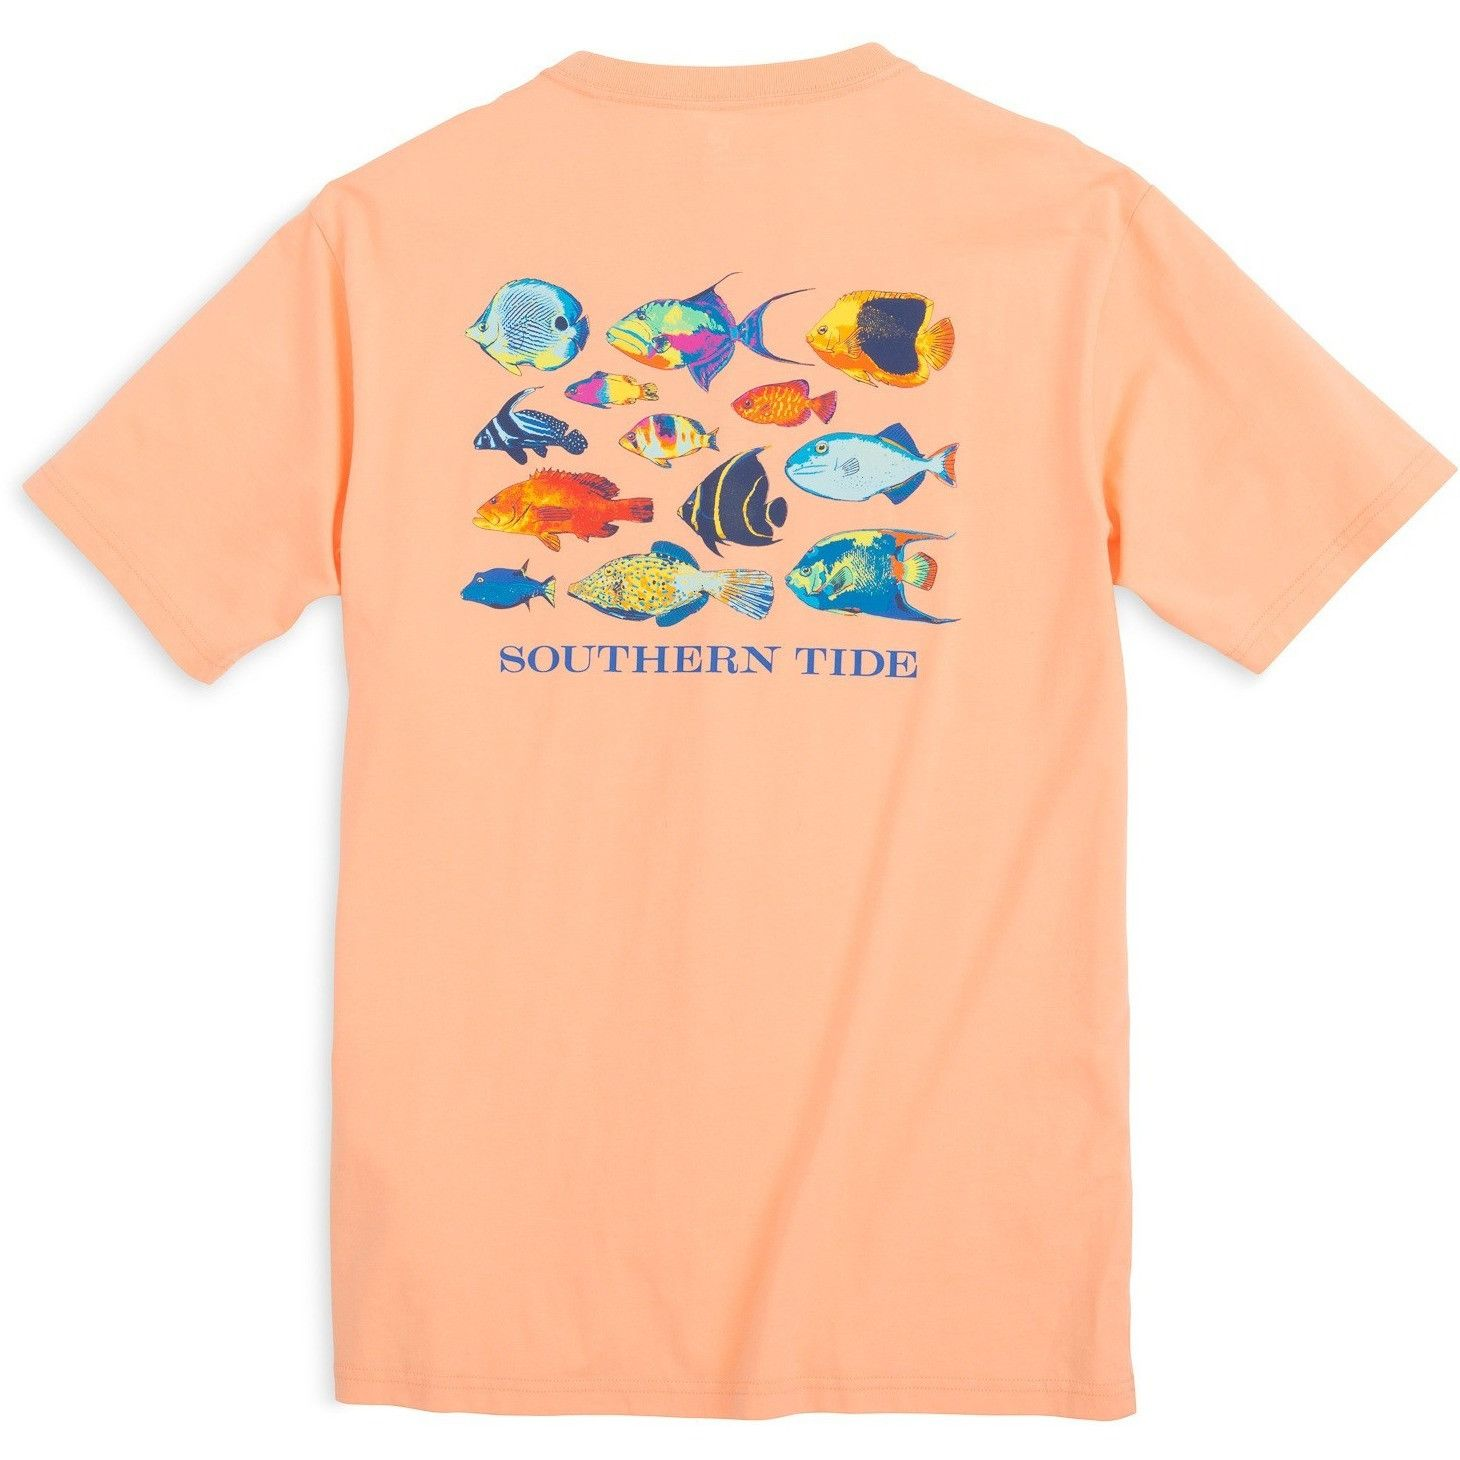 Southern Tide Caribbean Fish T-Shirt - Peach Fizz